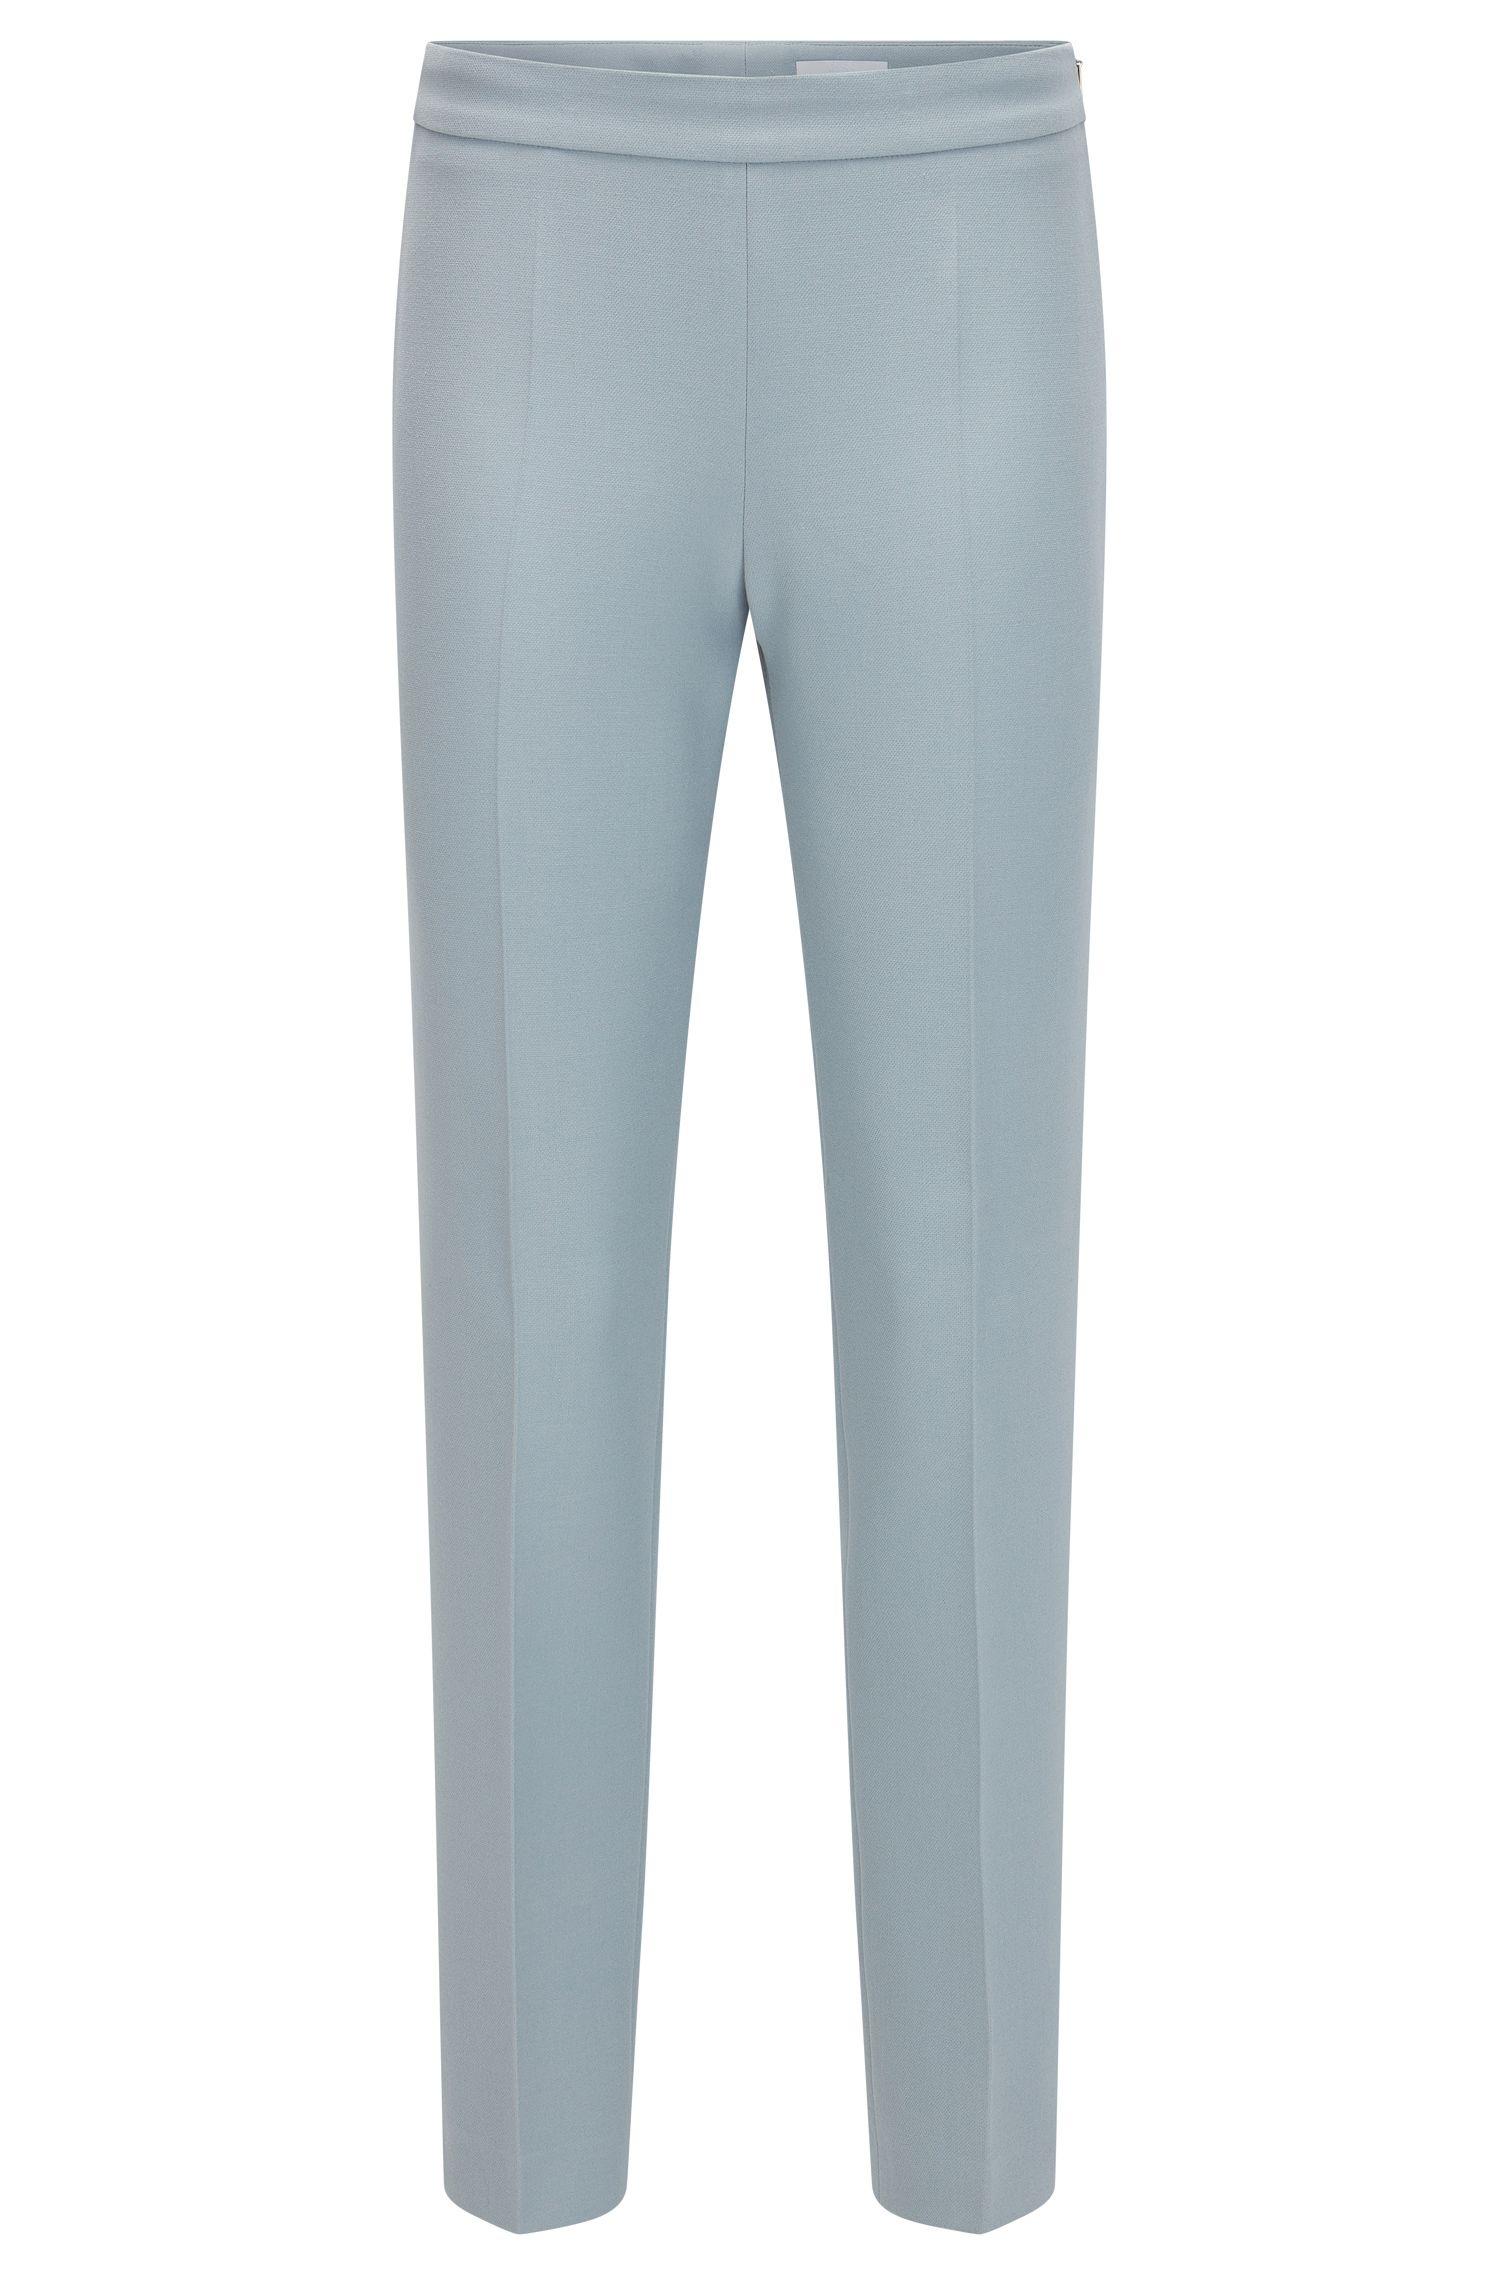 Pantaloni regular fit in tessuto elastico